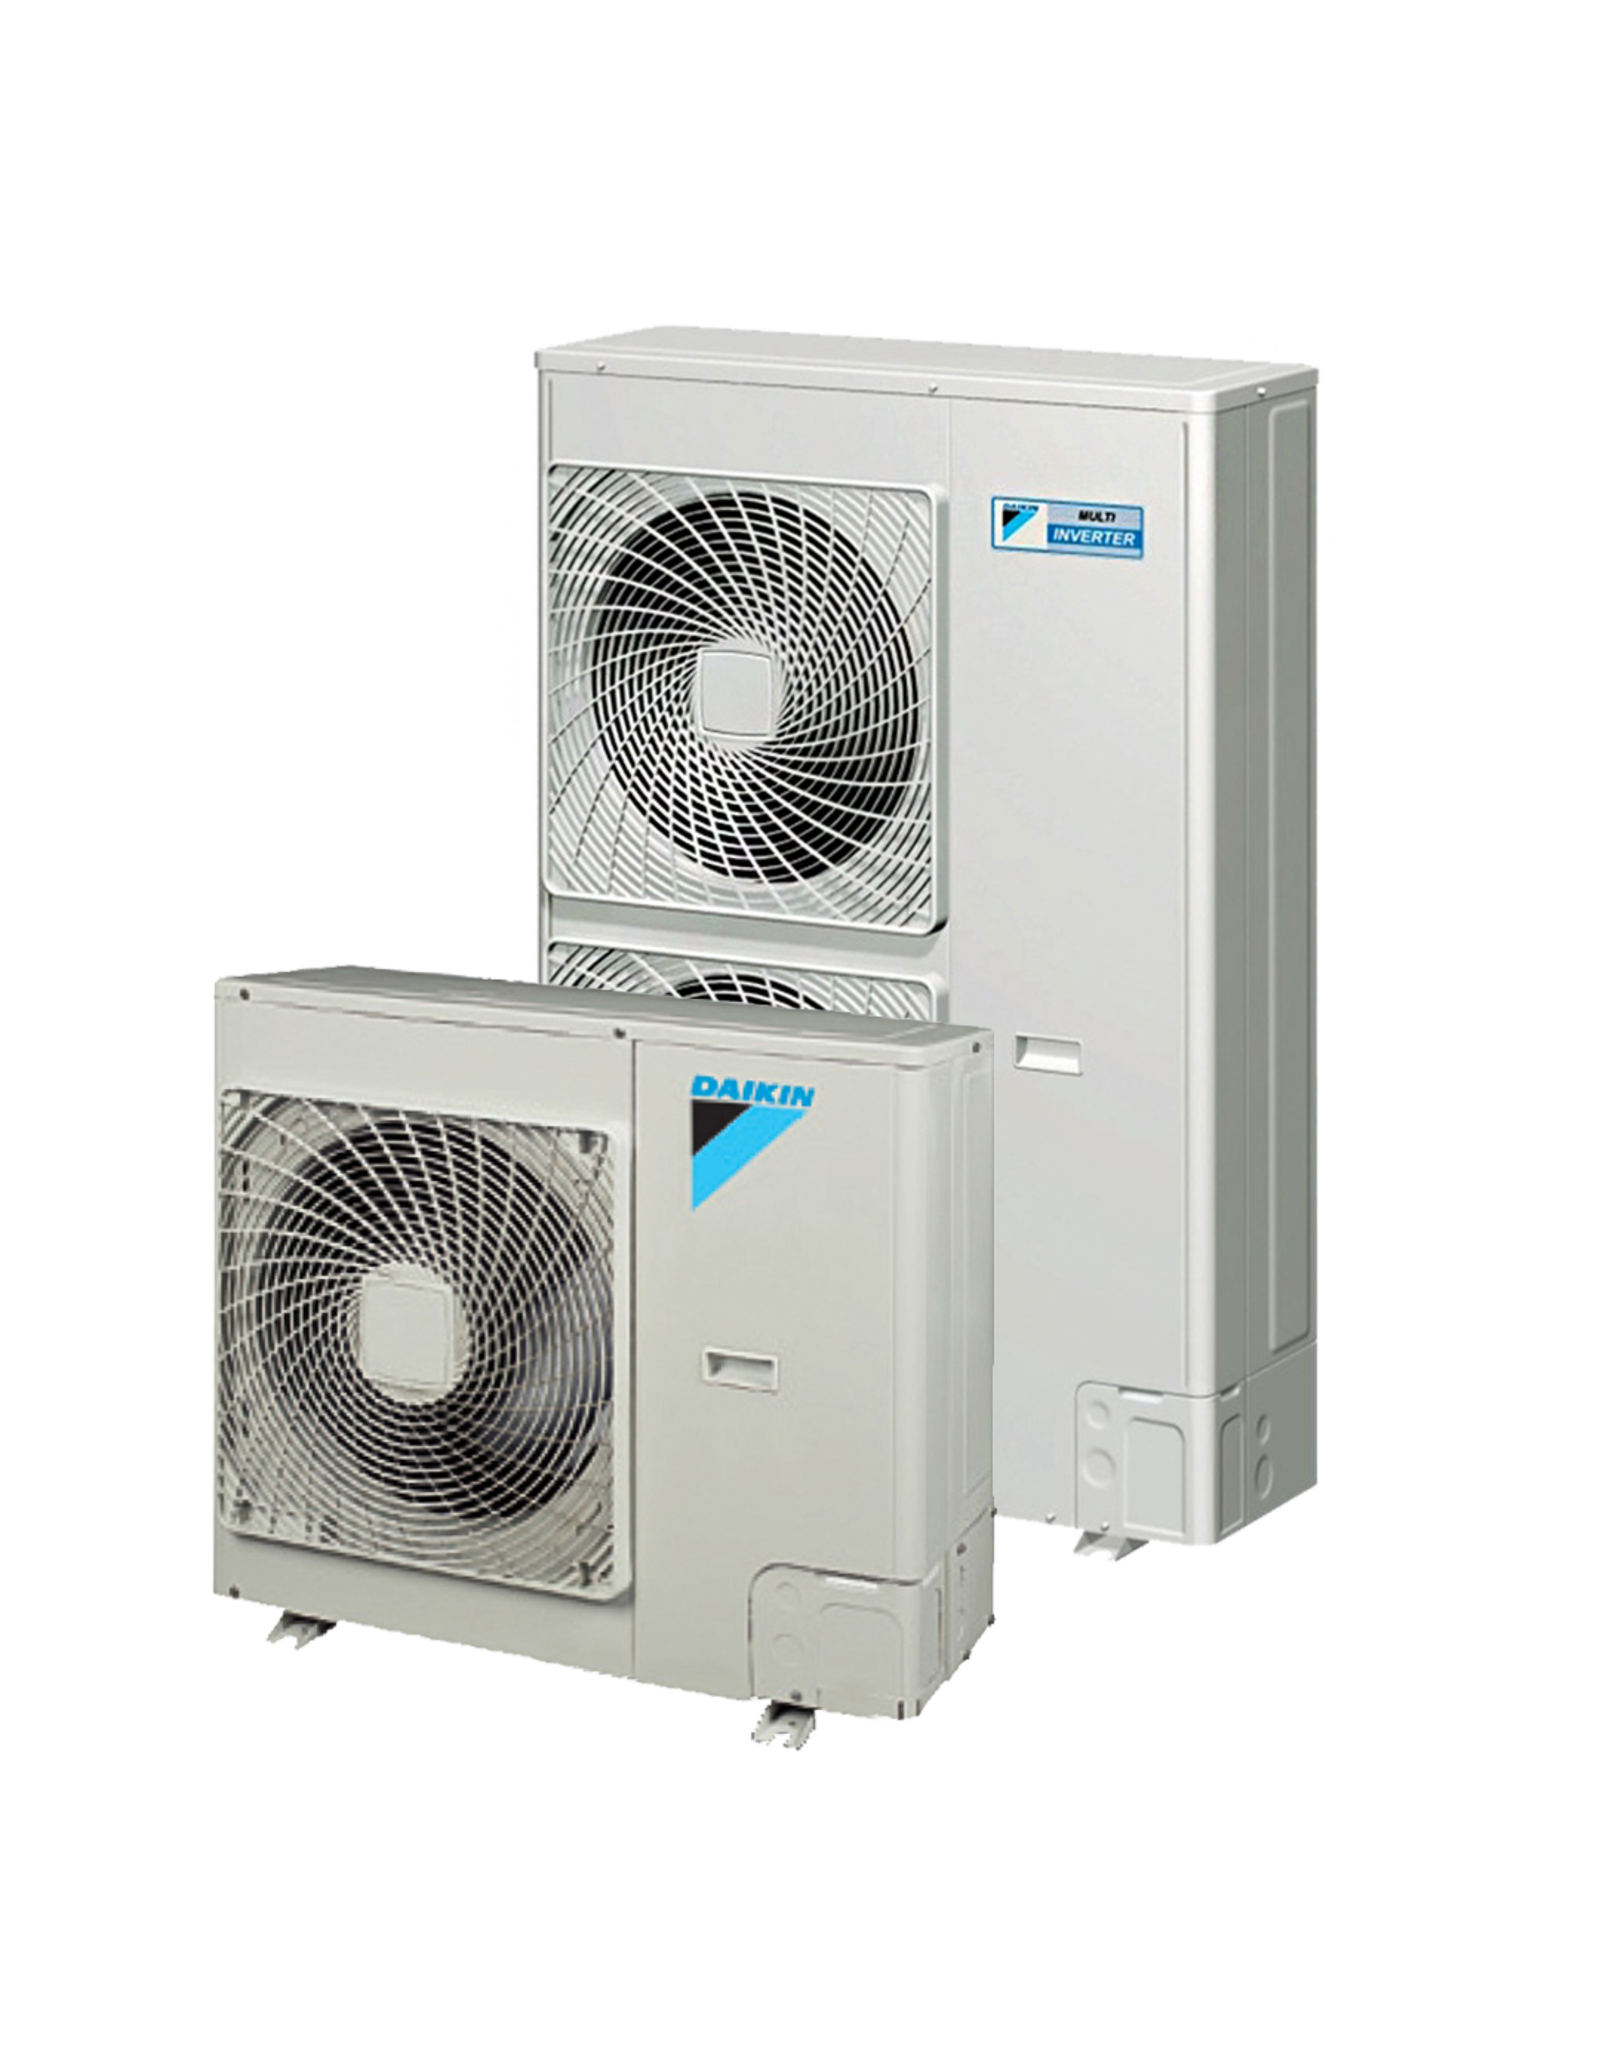 Daikin Applied Americas MXL Series Heat-Pump Multi Zone Condenser Unit - 208/230v - 1ph